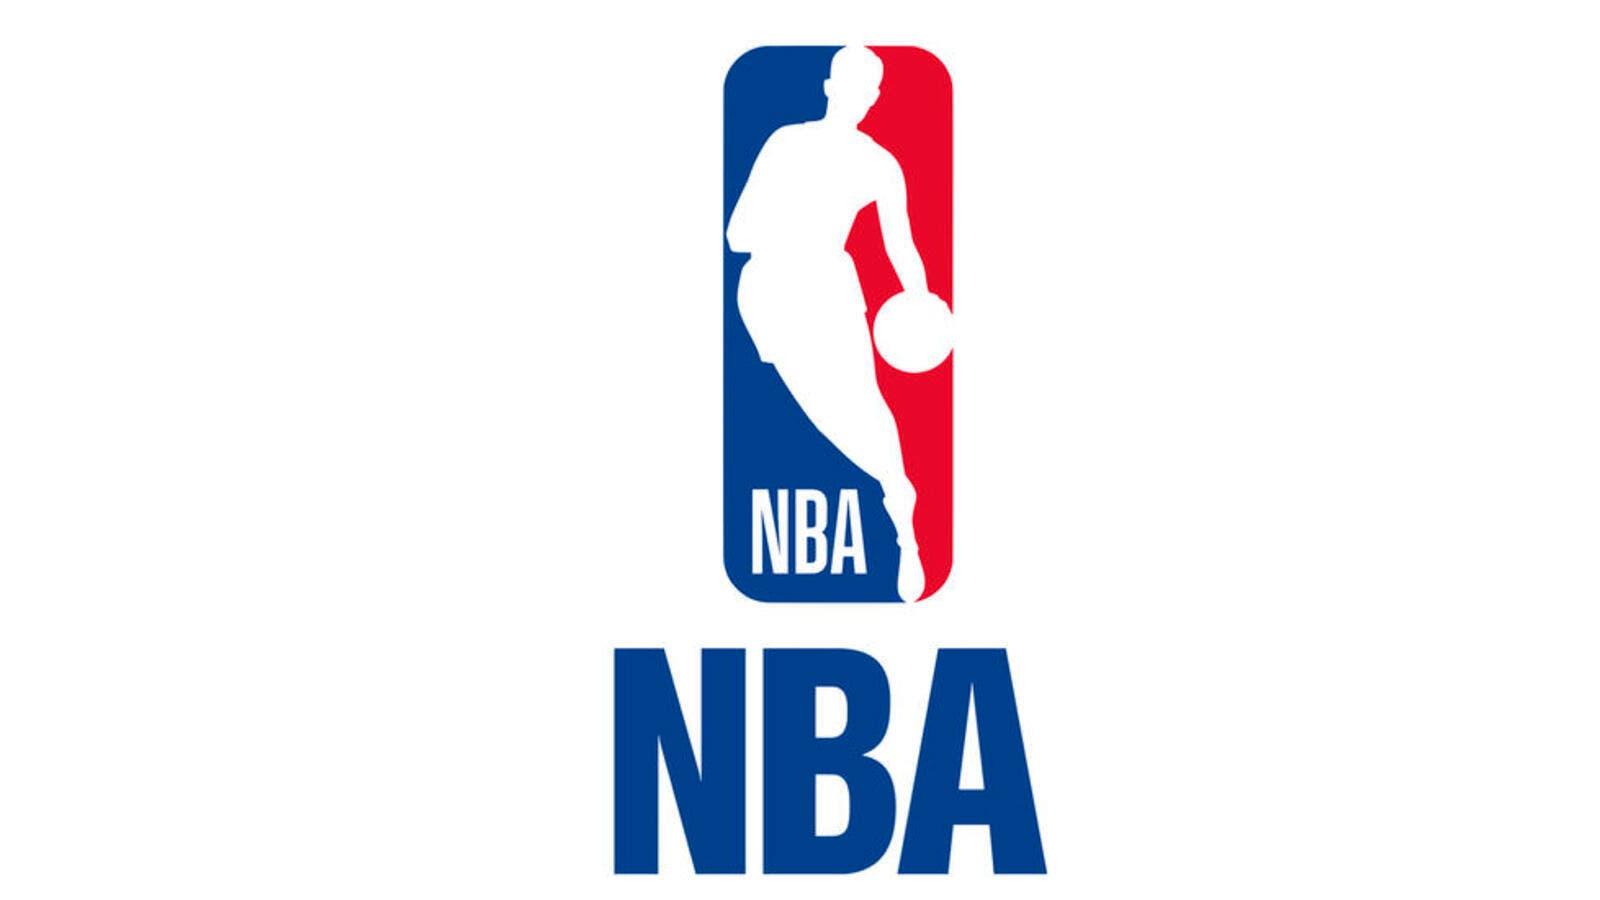 NBA就观赛礼仪问题向球队老板、高管和他们家人发出警告